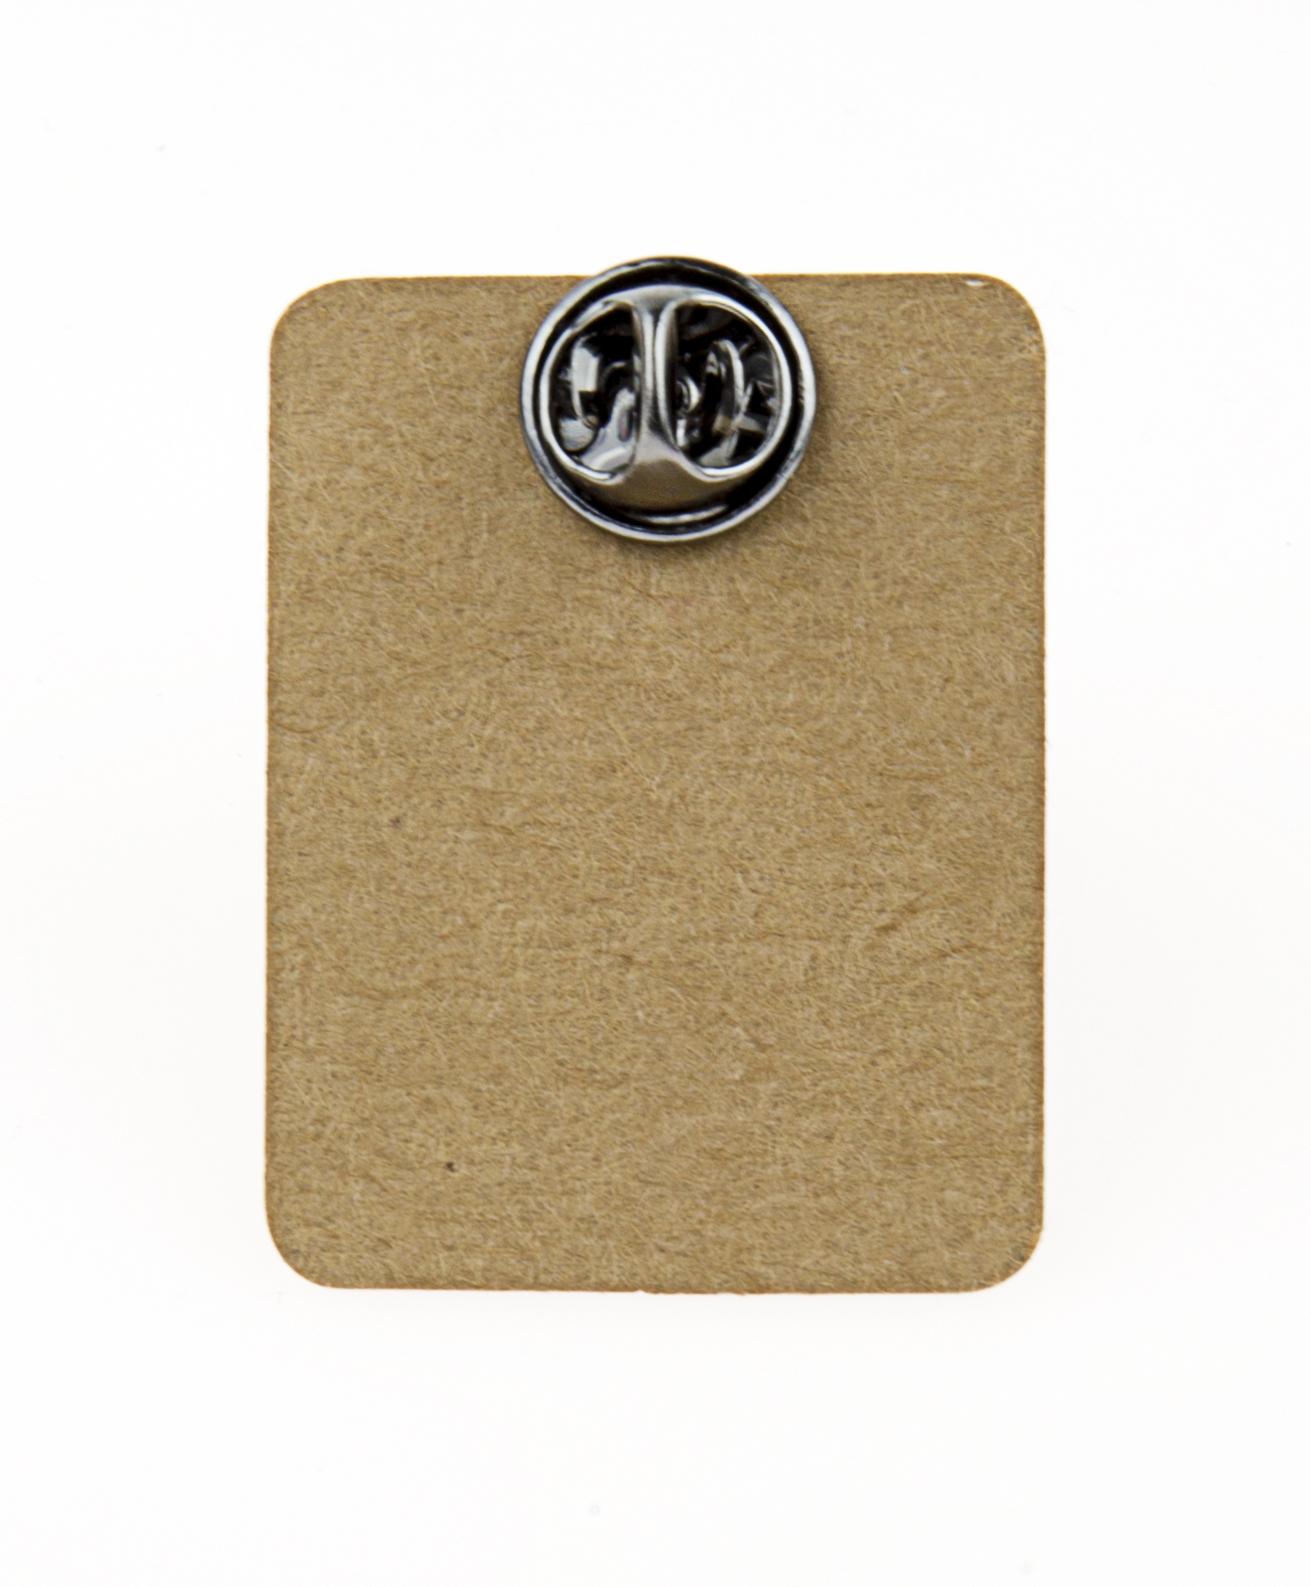 Metal Black Elephant Enamel Pin Badge